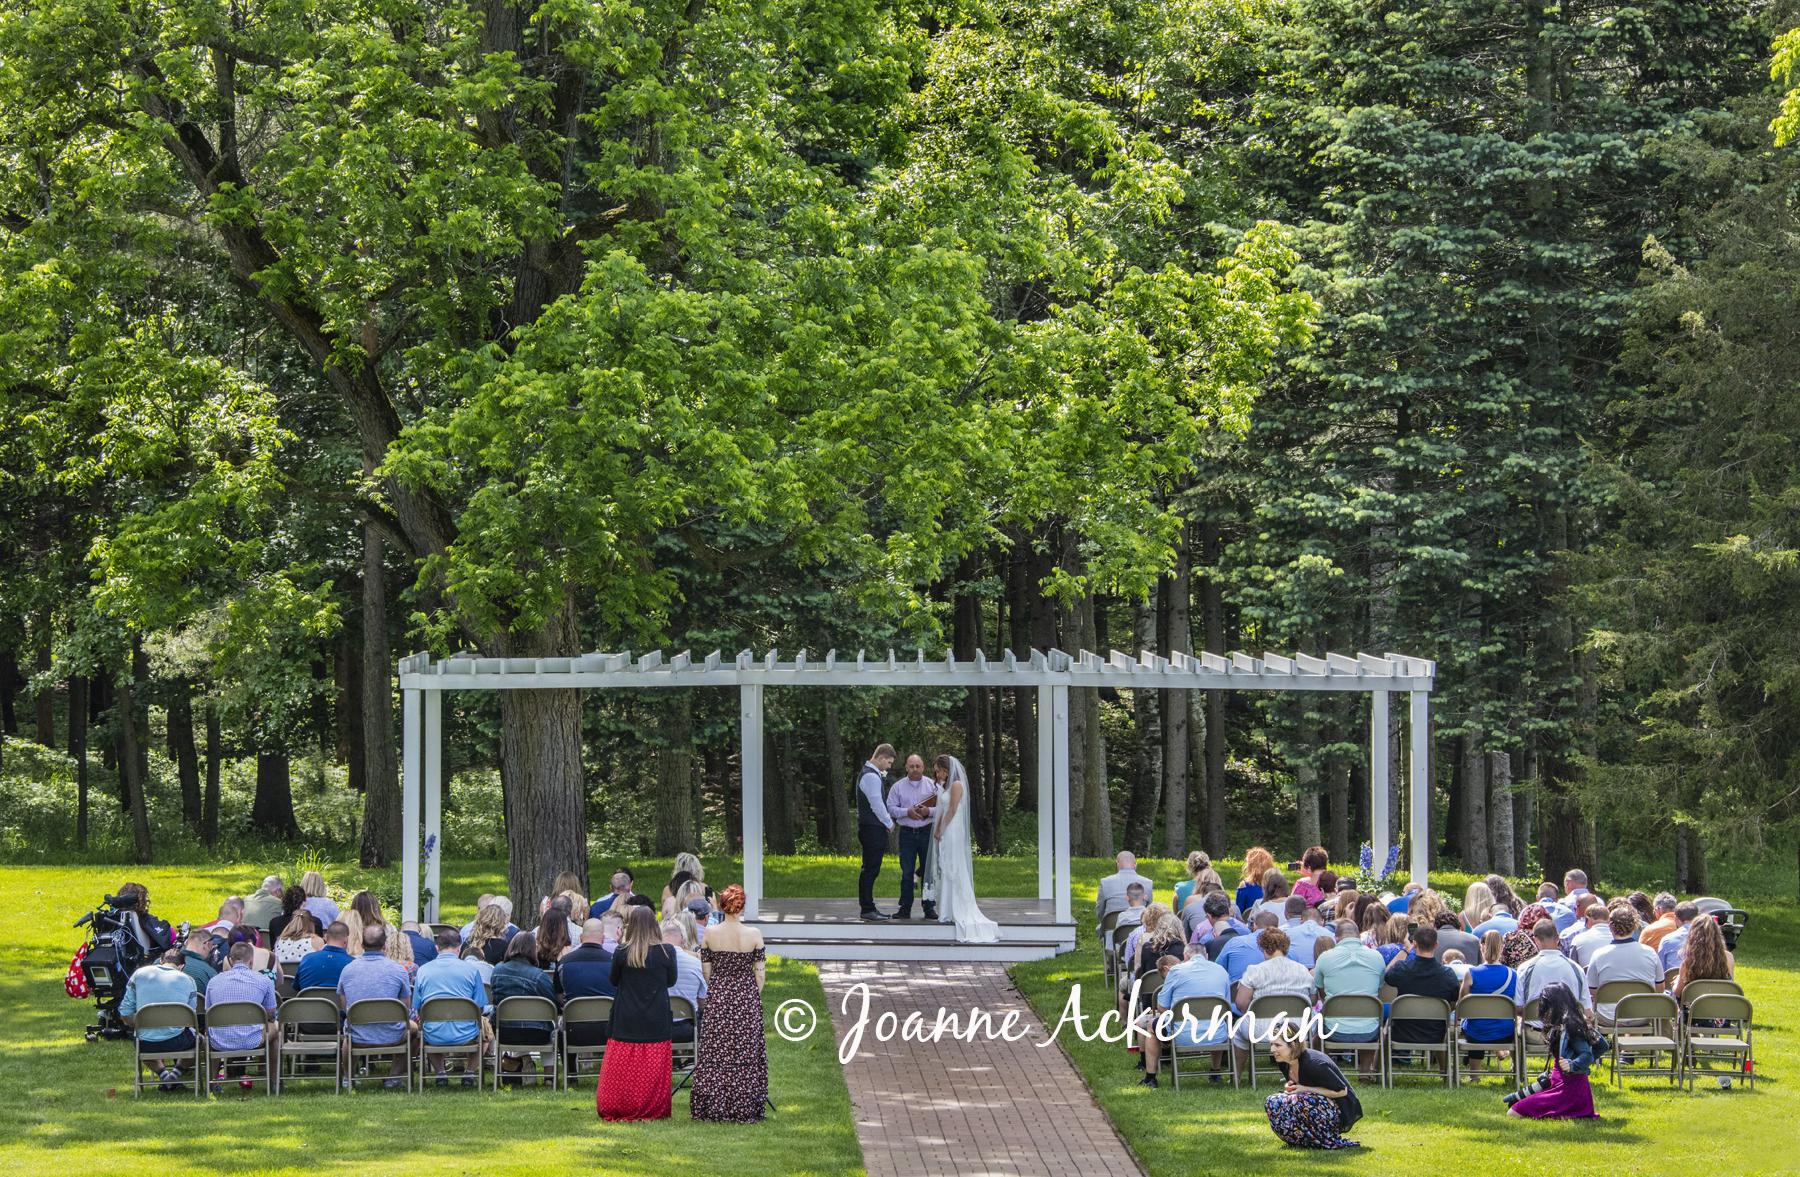 6 3 2018 Chandler Leah Wedding 4102 copy.jpg